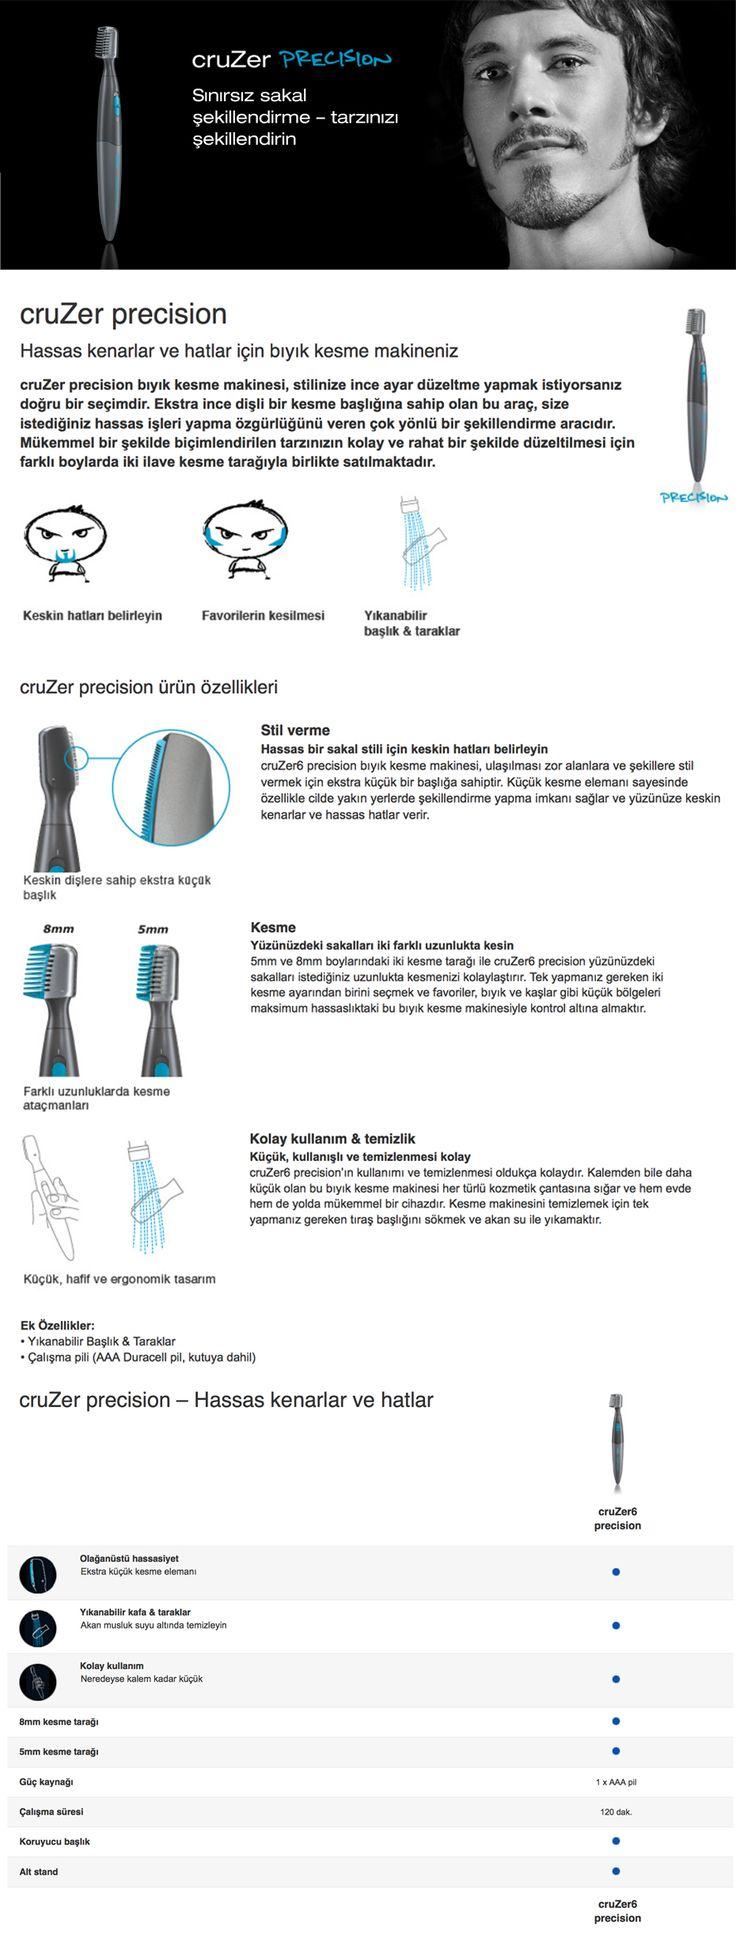 Braun cruZer Precision Sakal Kesme ve Şekillendirme